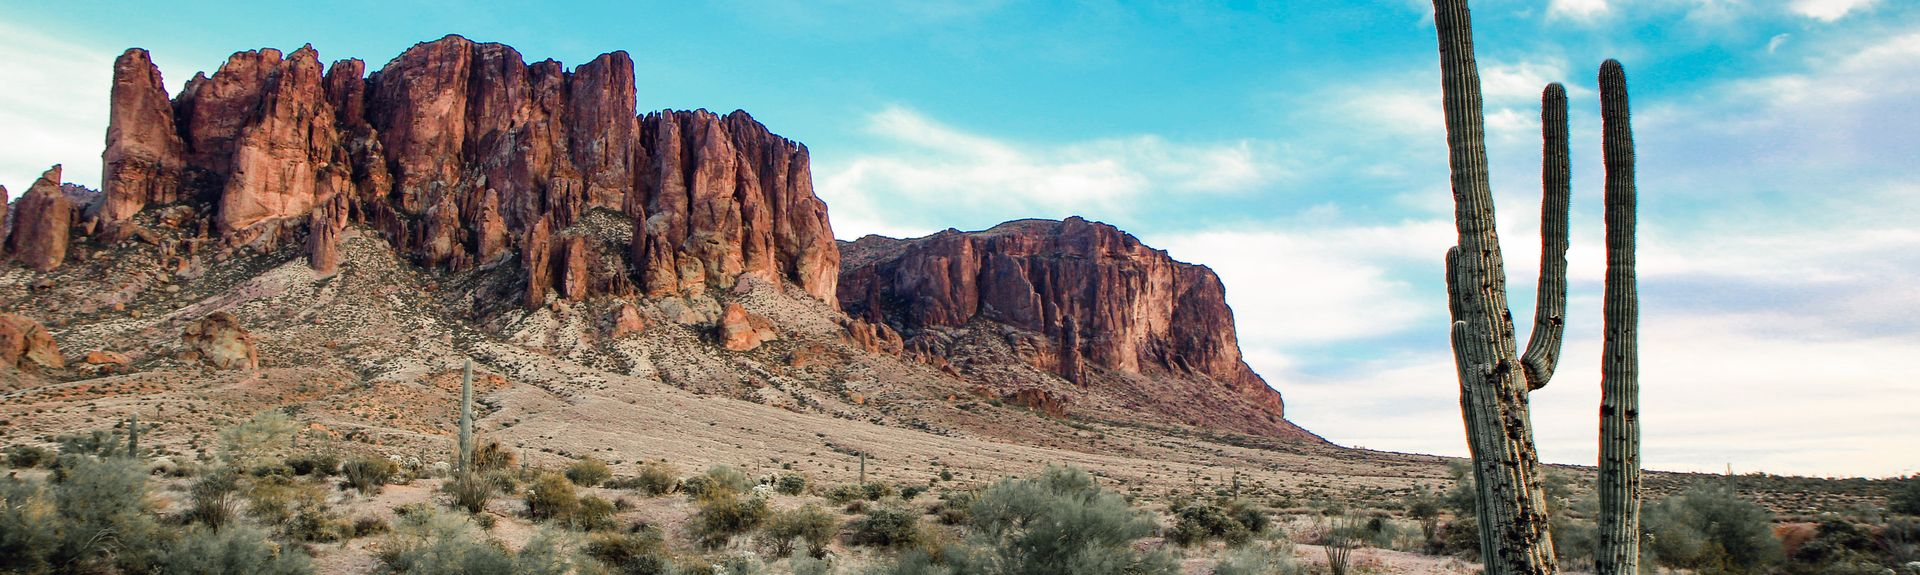 SanTan Village, Gilbert, Arizona, Vereinigte Staaten